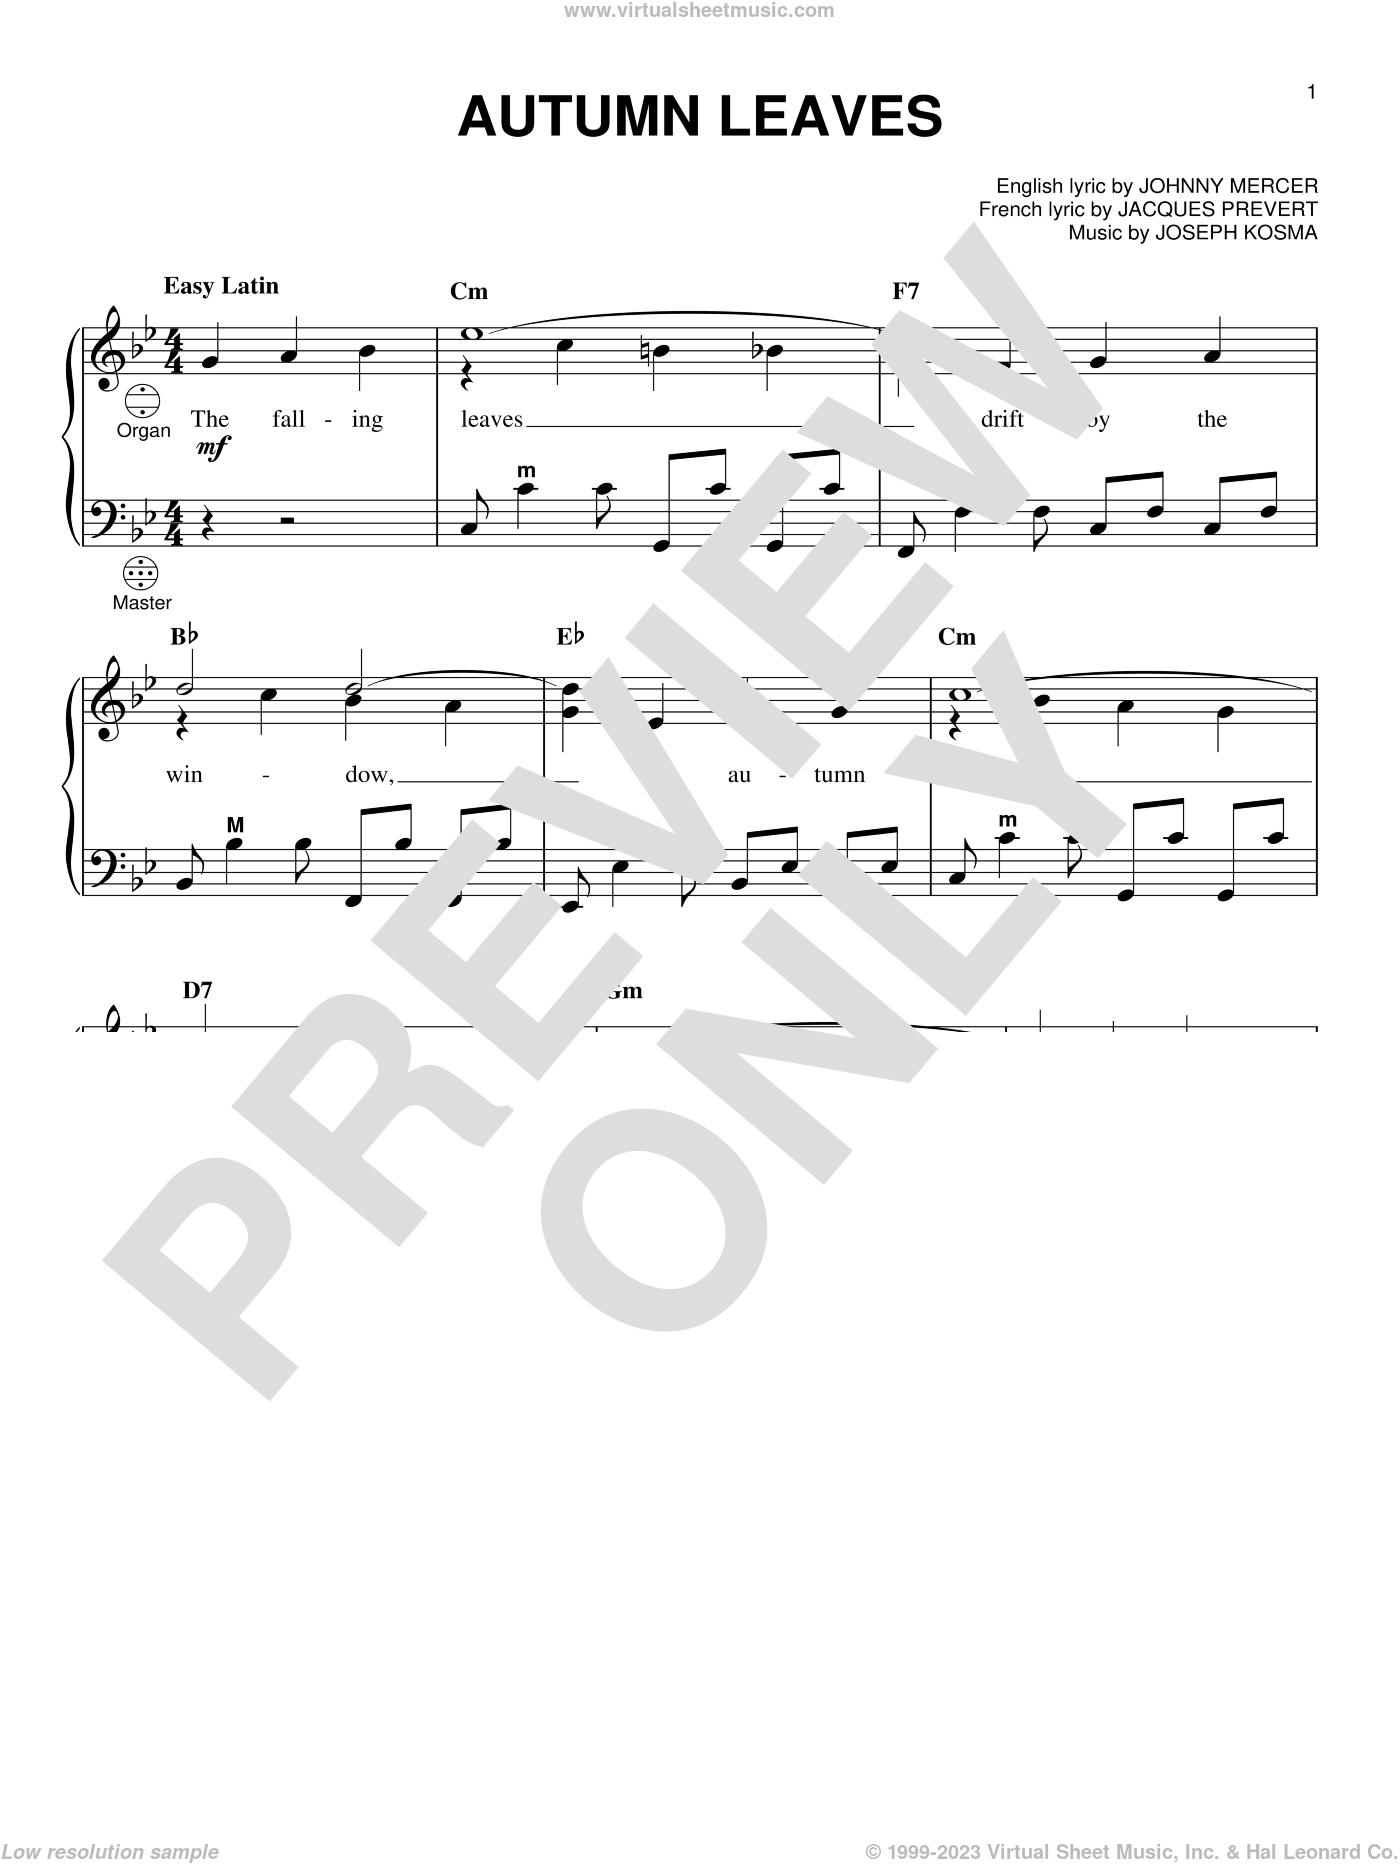 Autumn Leaves sheet music for accordion by Miles Davis, Gary Meisner, Jacques Prevert, Johnny Mercer and Joseph Kosma, intermediate skill level